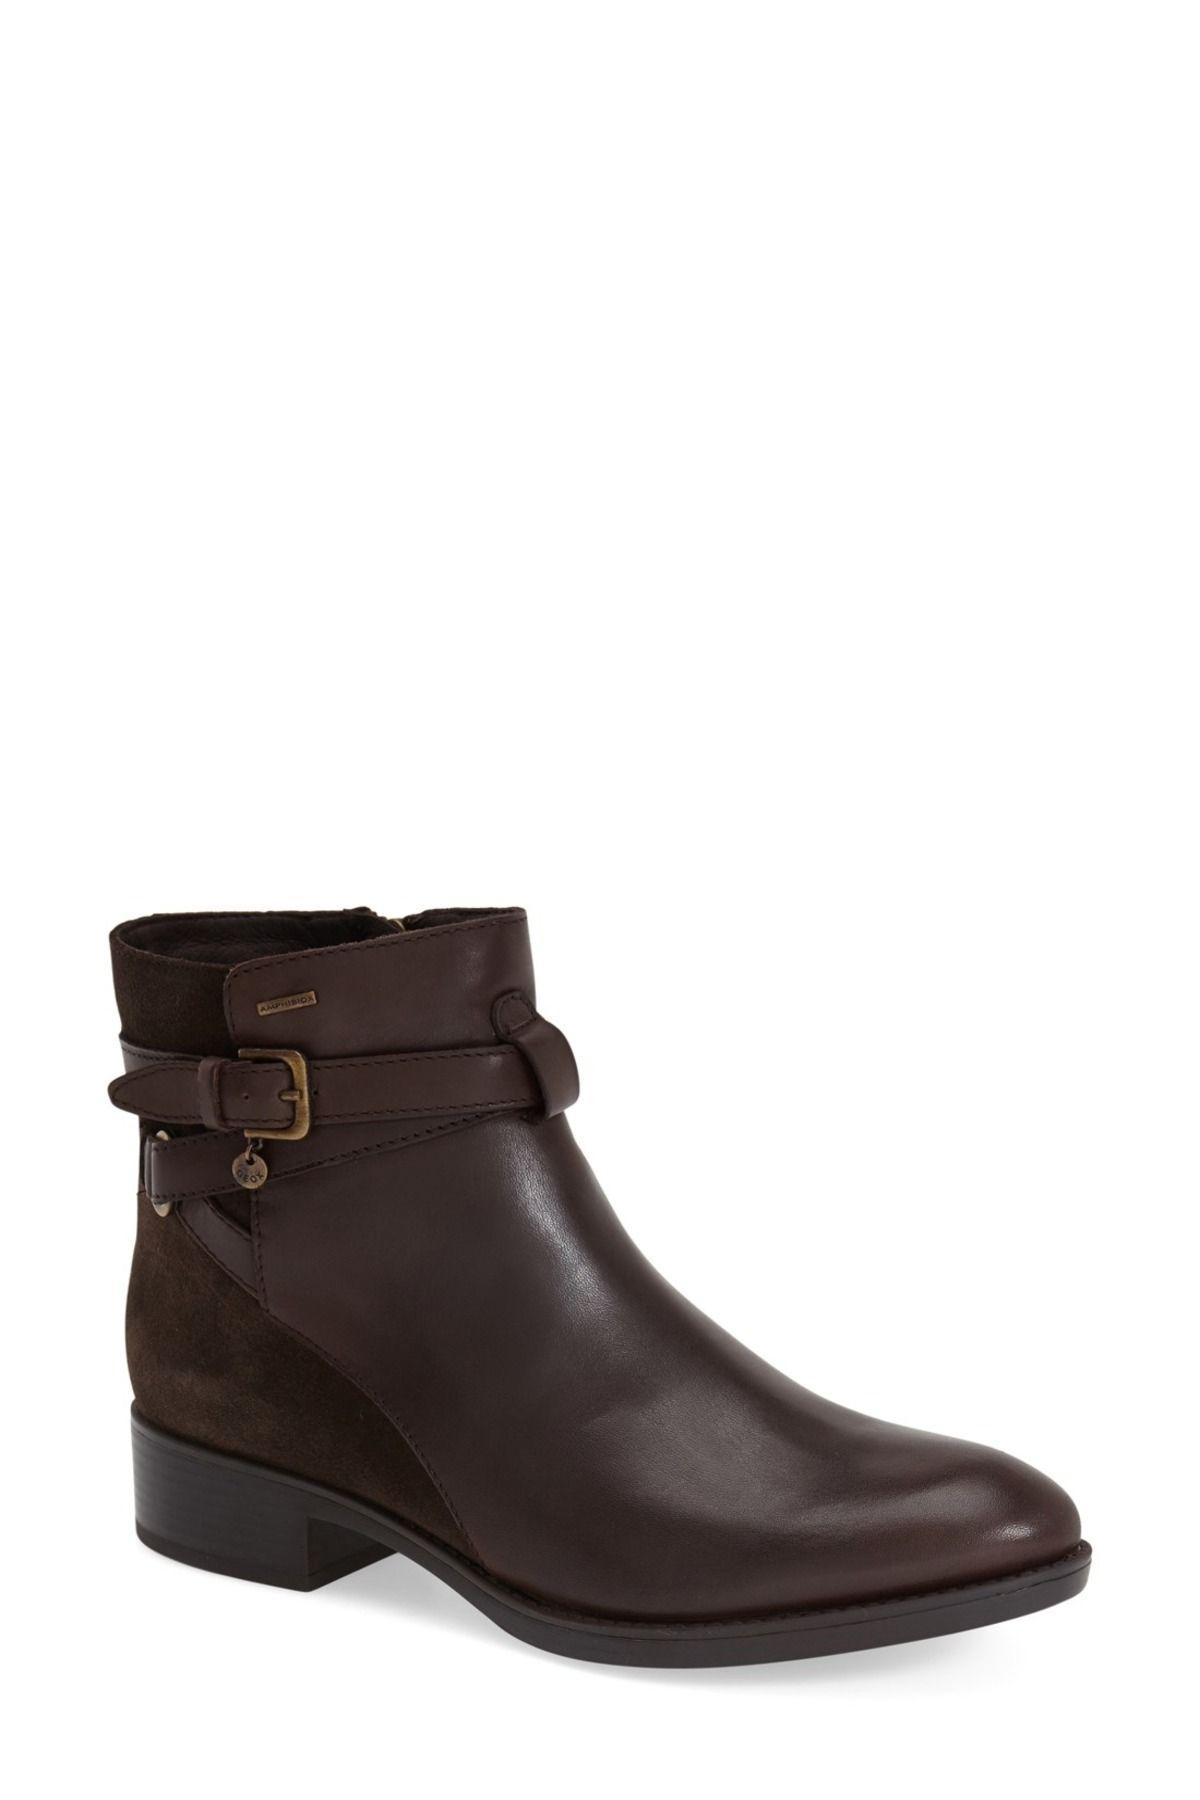 2c663842884 'Felicity' Amphibiox(R) Waterproof Ankle Boot (Women) by GEOX on  @nordstrom_rack. '